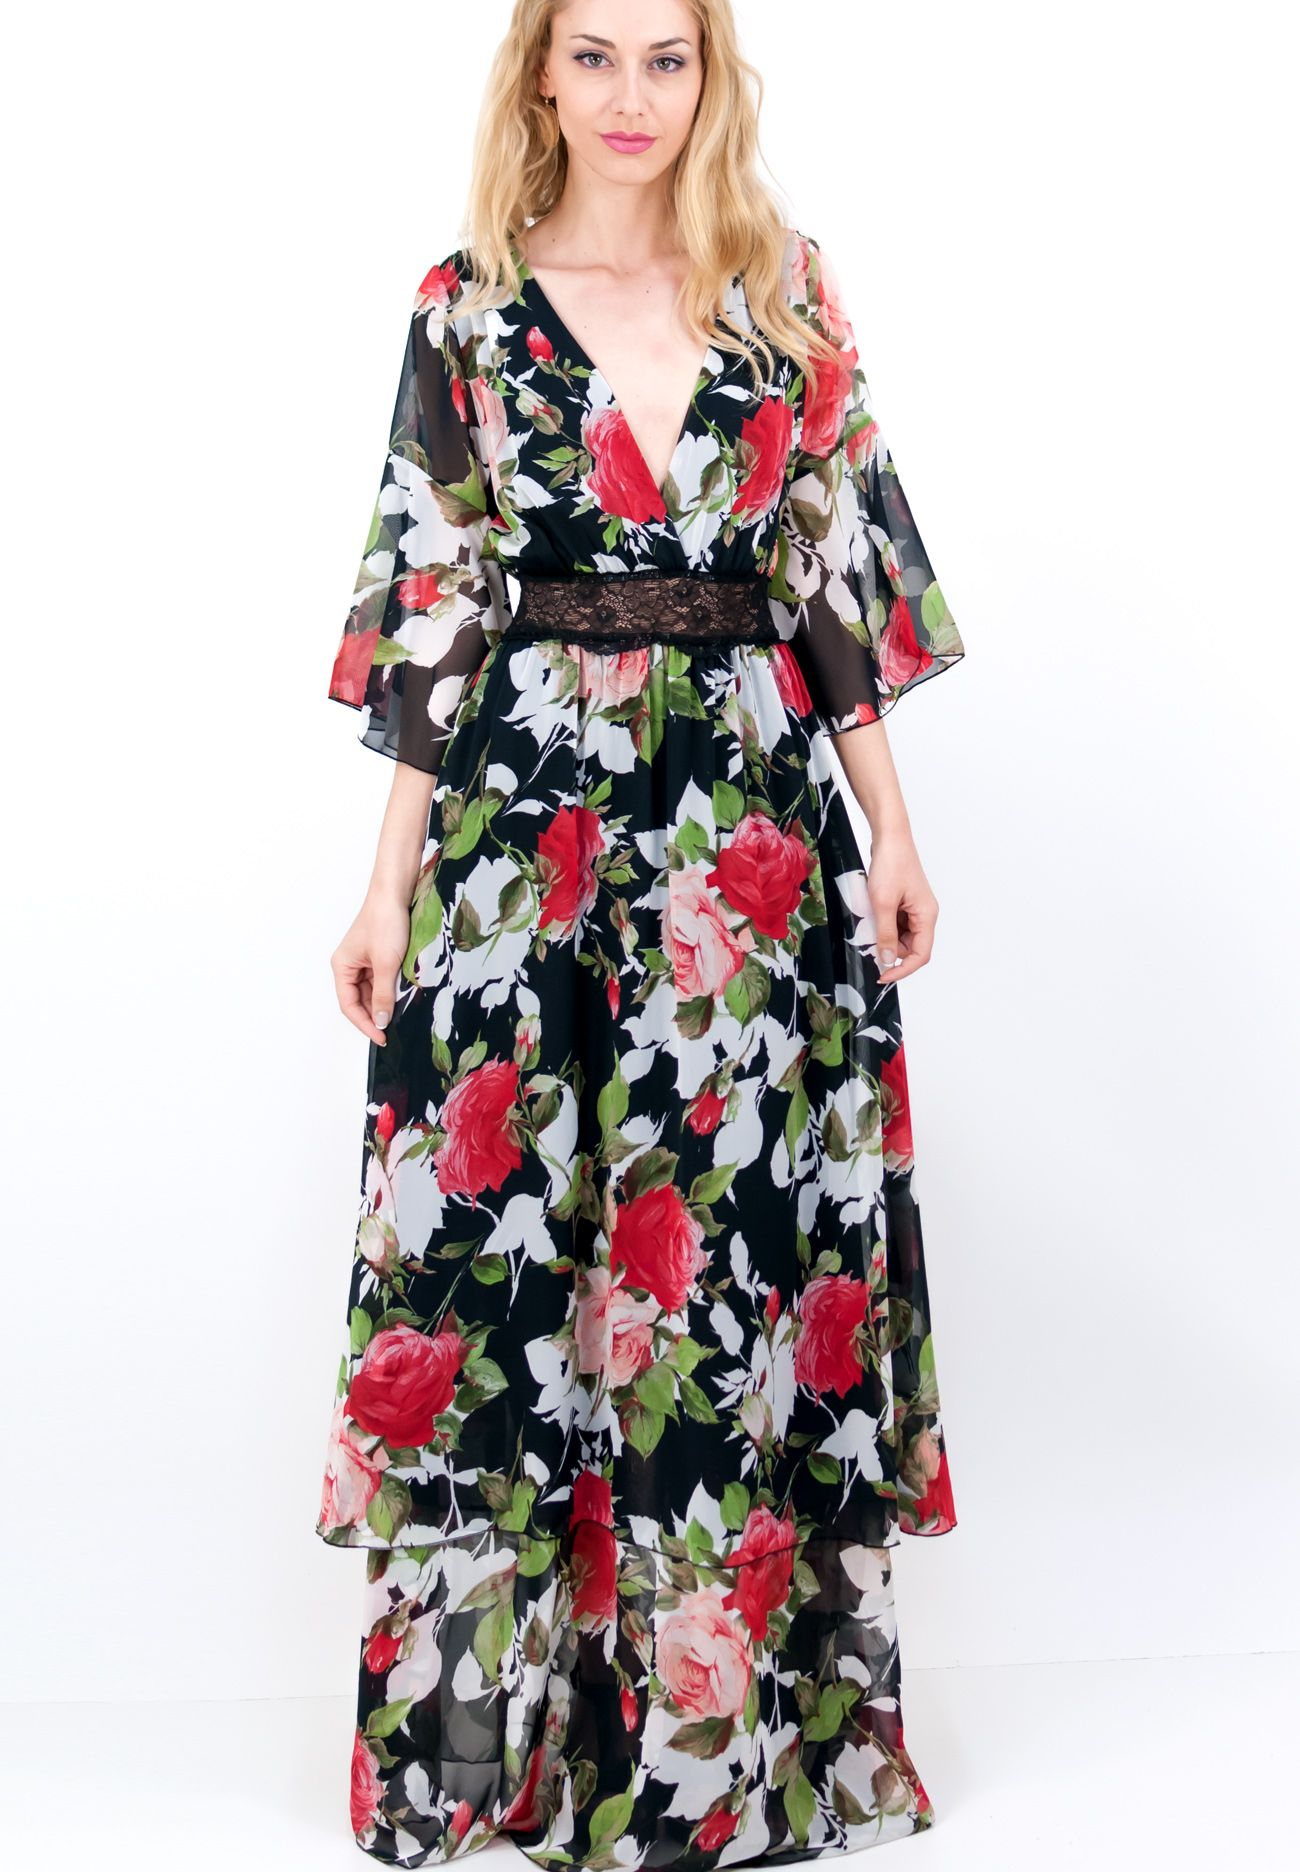 b4ab1024cb90 Μακρύ εμπριμέ φόρεμα με βολάν και δαντέλα στη μέση. - ΦΟΡΕΜΑΤΑ - ΕΝΔΥΜΑΤΑ     ZicZac